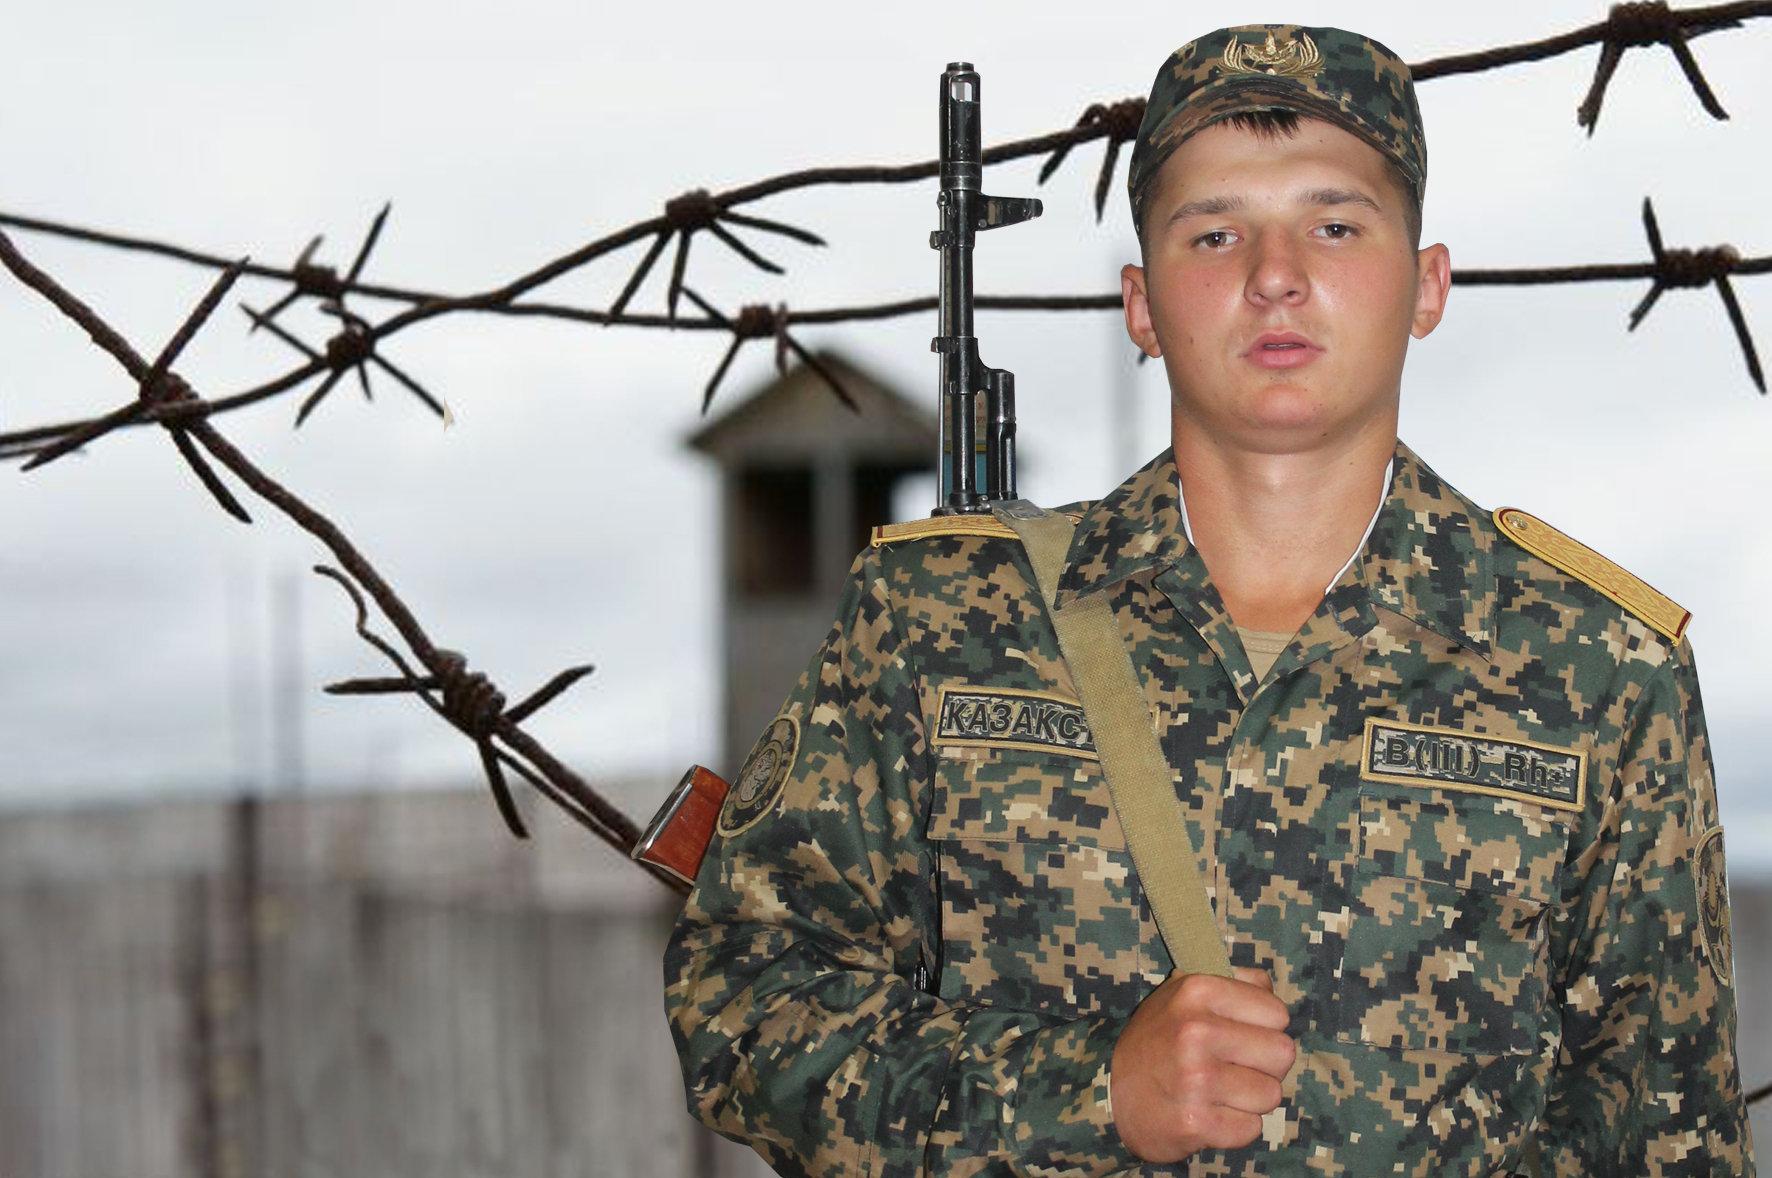 6698 әскери бөлімінің жедел қызметінің әскери қызметшісі Иван Дорохин